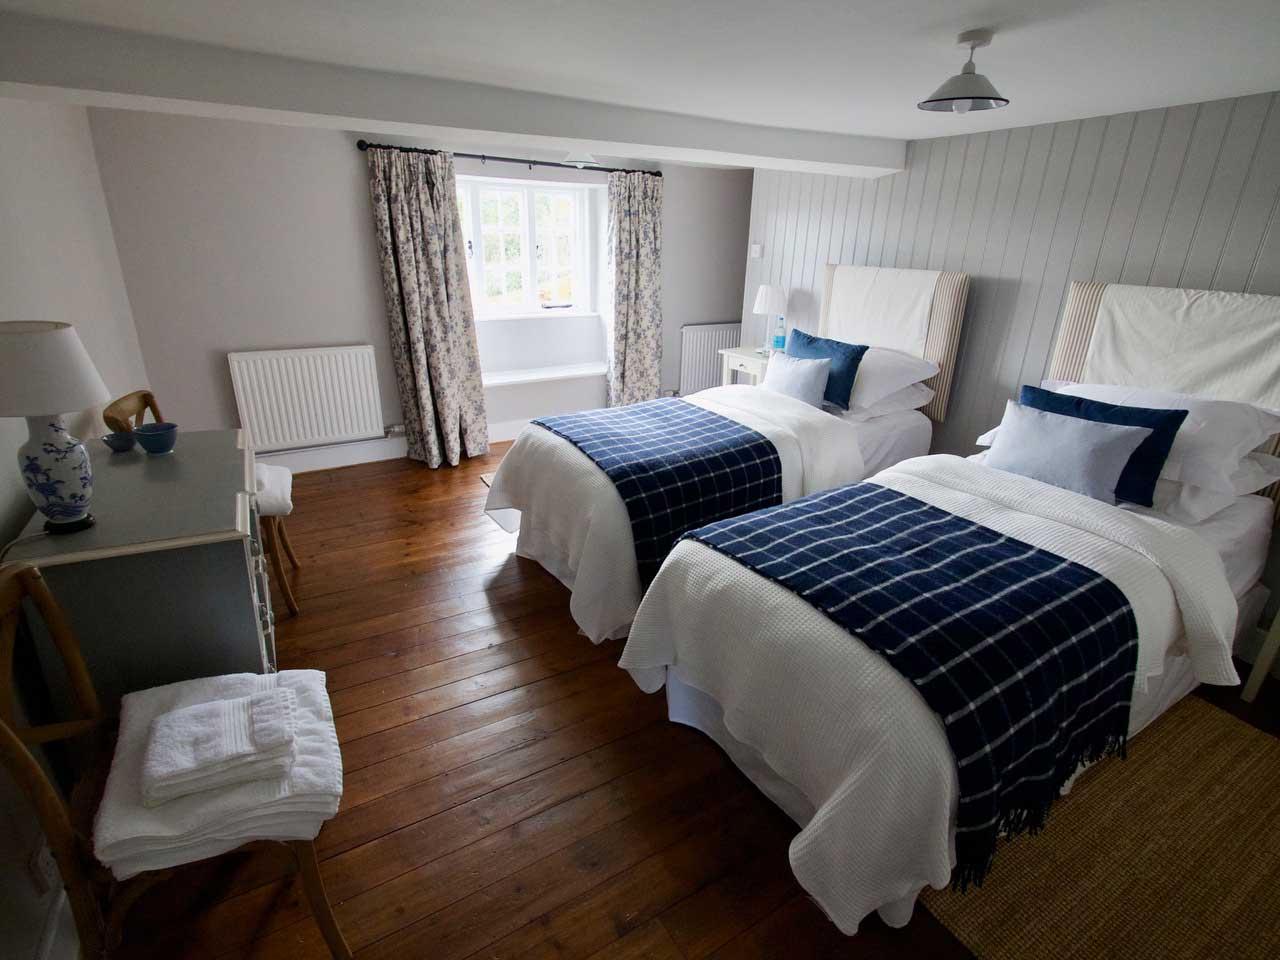 The Garden Cottage Bedroom - wedding accommodation in Dorset